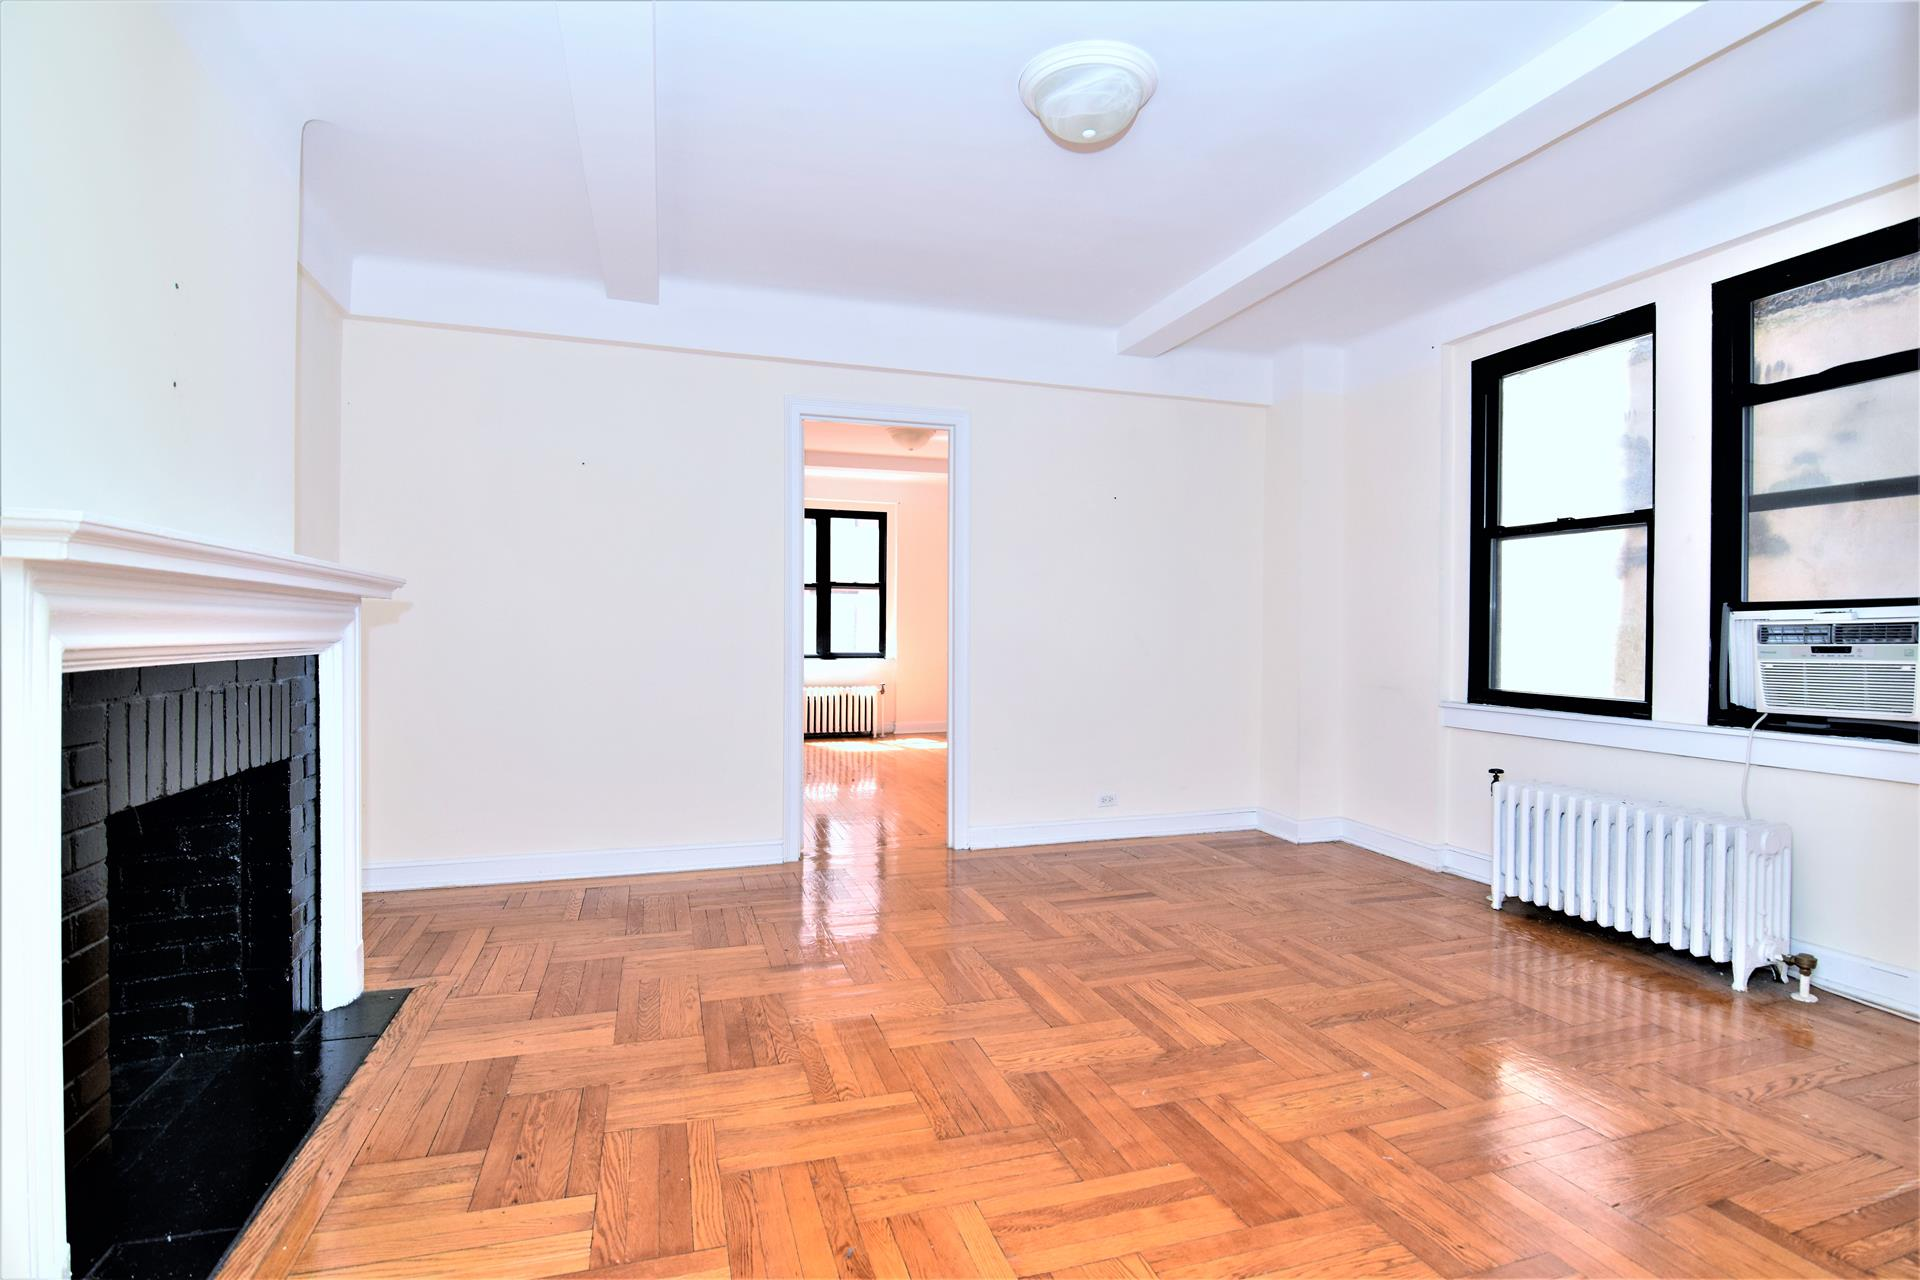 192 East 75th St, 7D - Upper East Side, New York